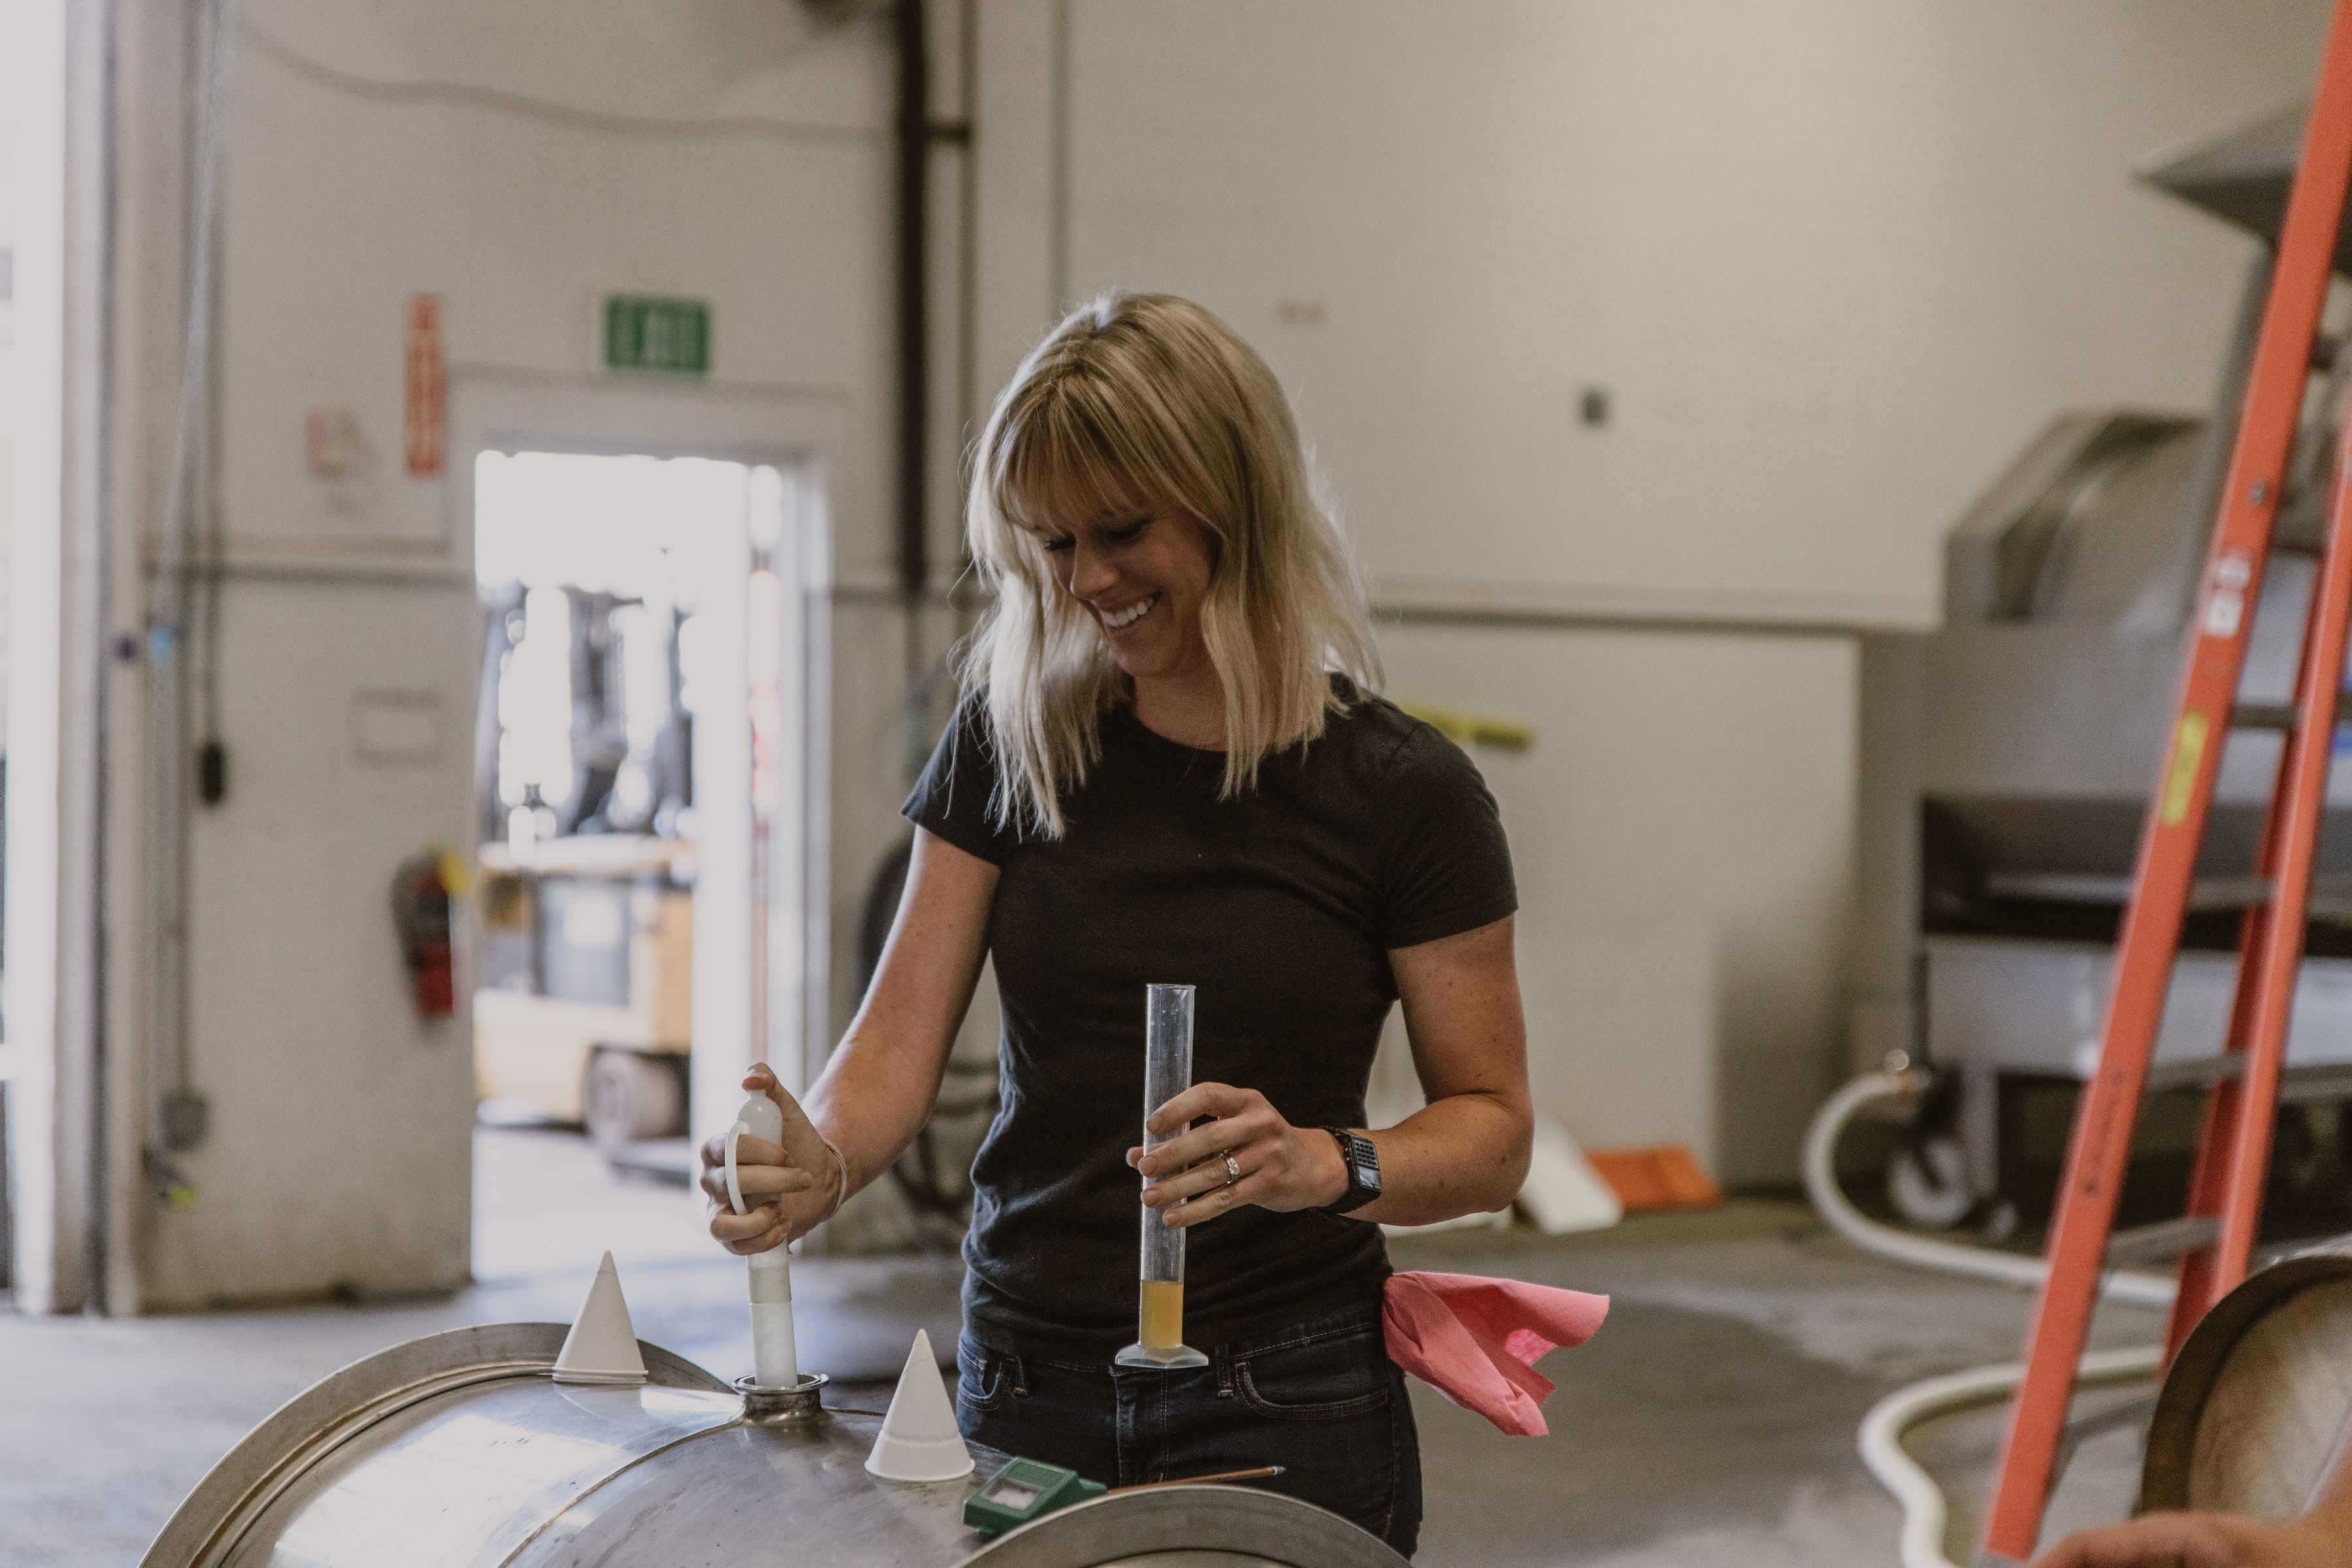 Senior Assistant Winemaker Chelsea Franchi